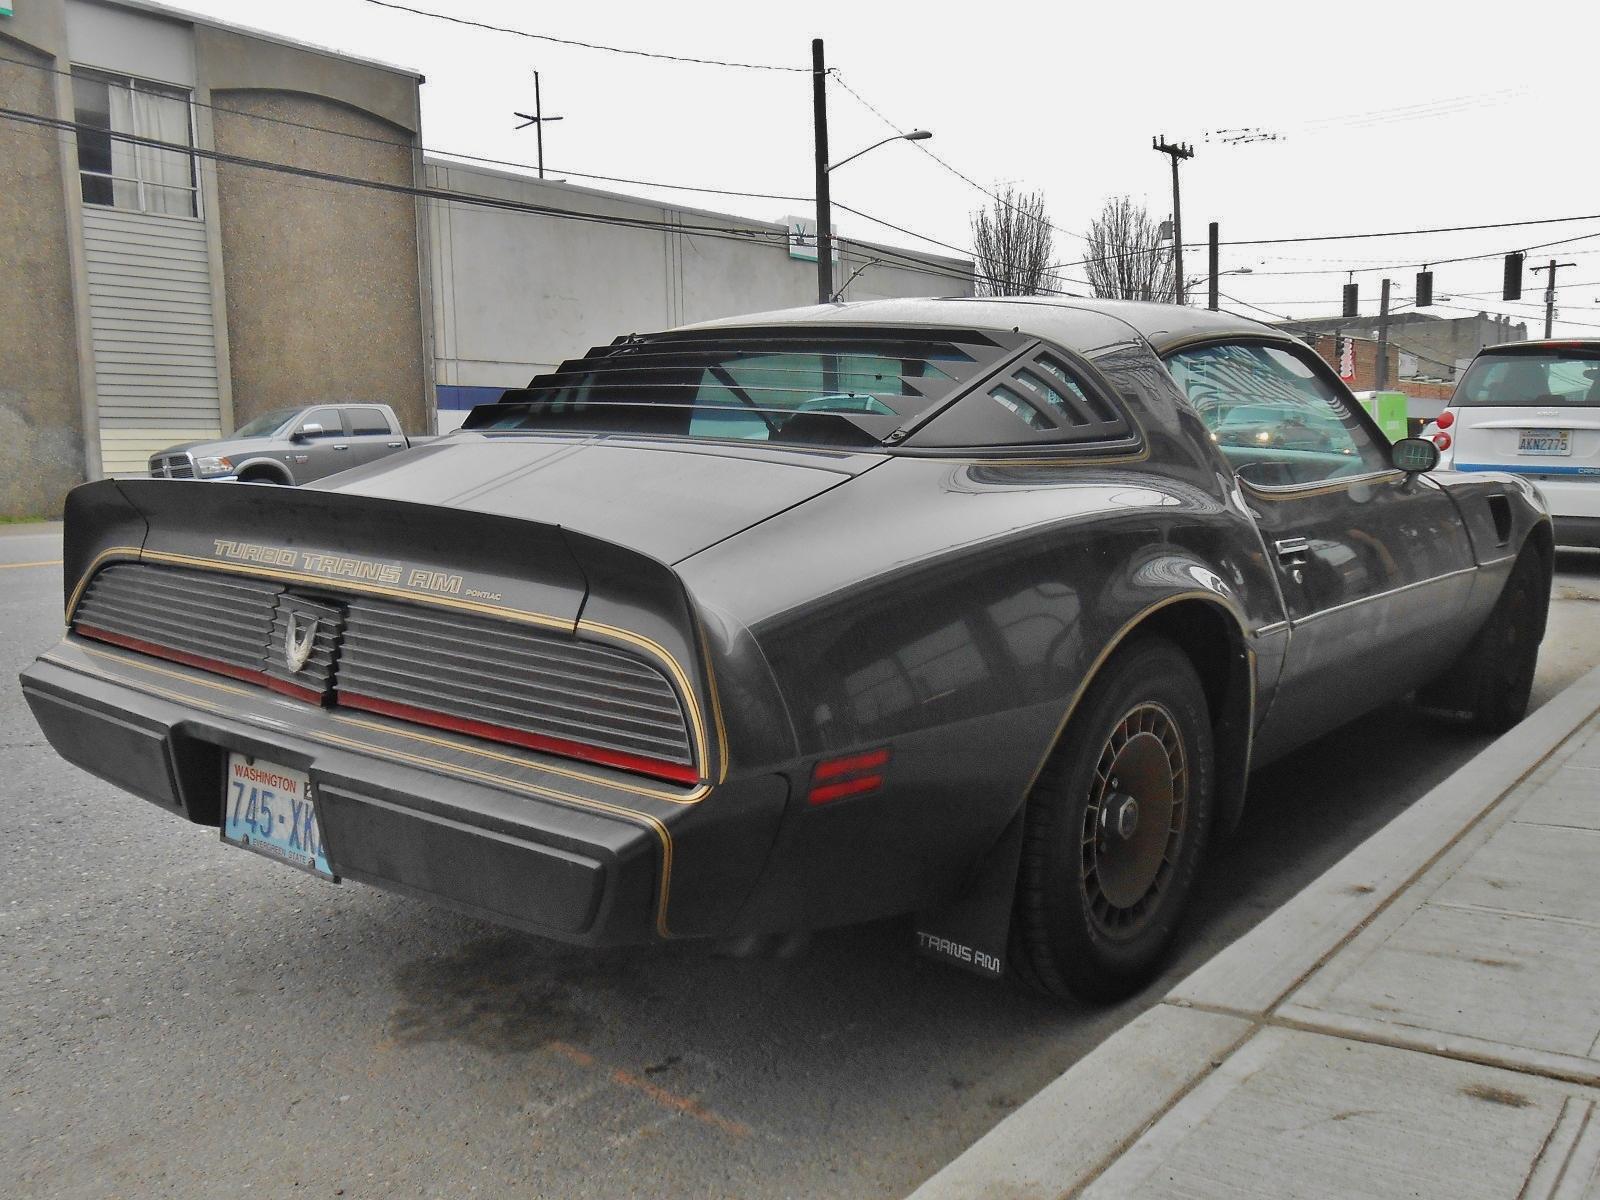 seattle 39 s parked cars 1981 pontiac firebird trans am turbo. Black Bedroom Furniture Sets. Home Design Ideas